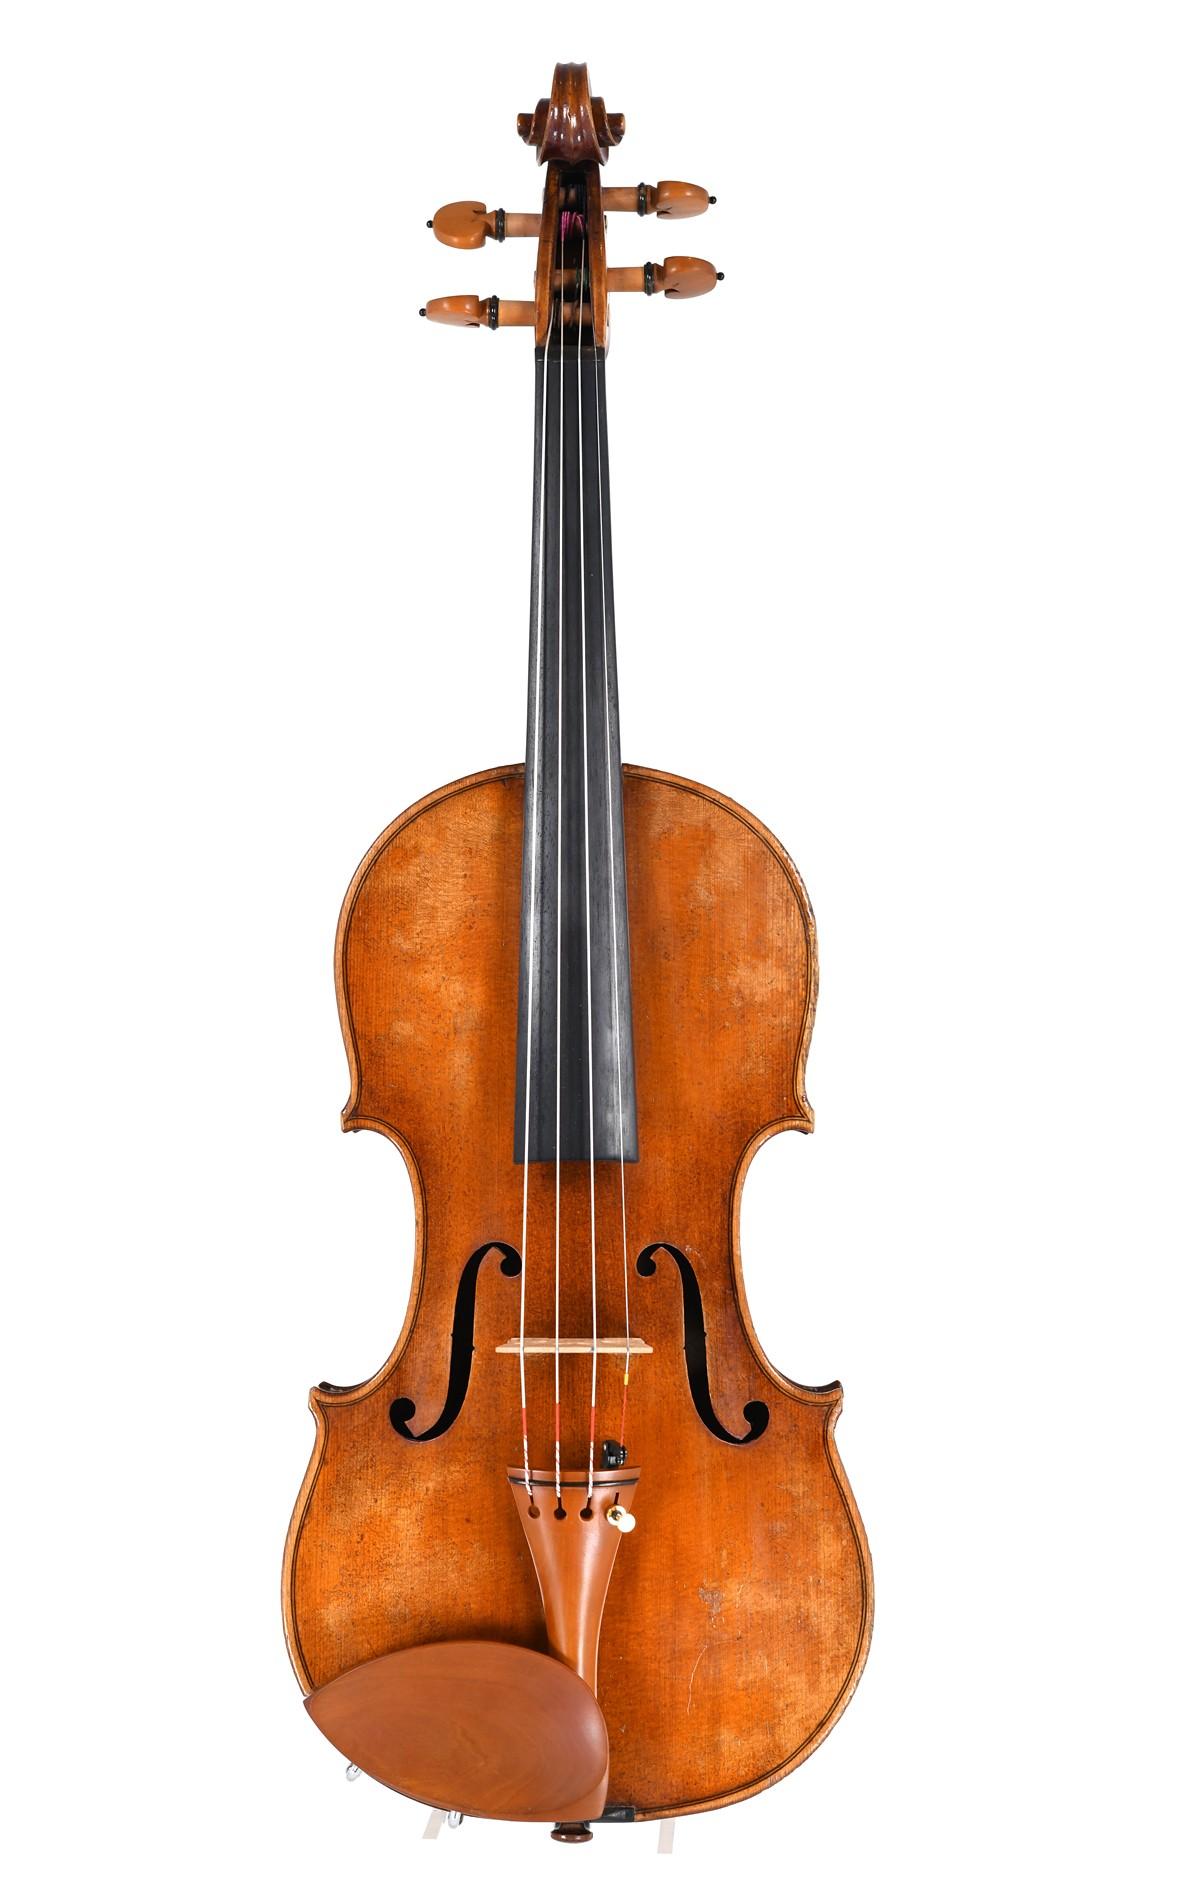 Petite German-Bohemian violin after Bergonzi - table